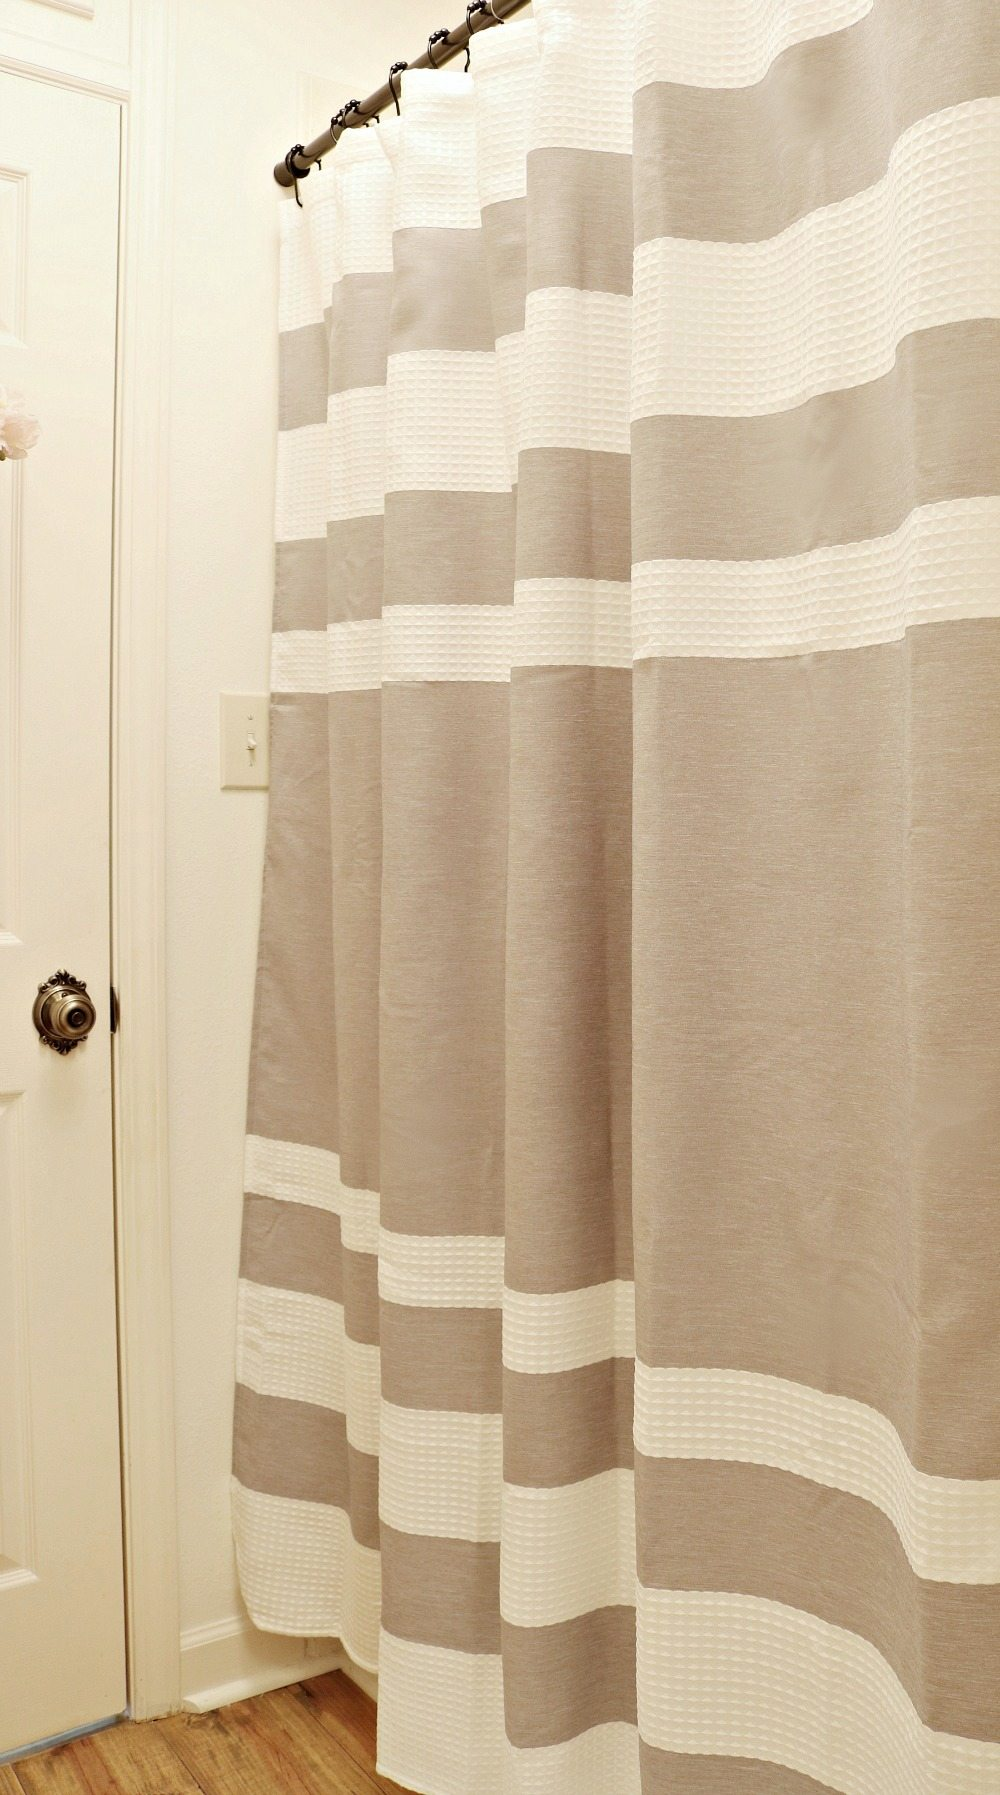 Waffle stripe shower curtain perfect for a neutral bathroom